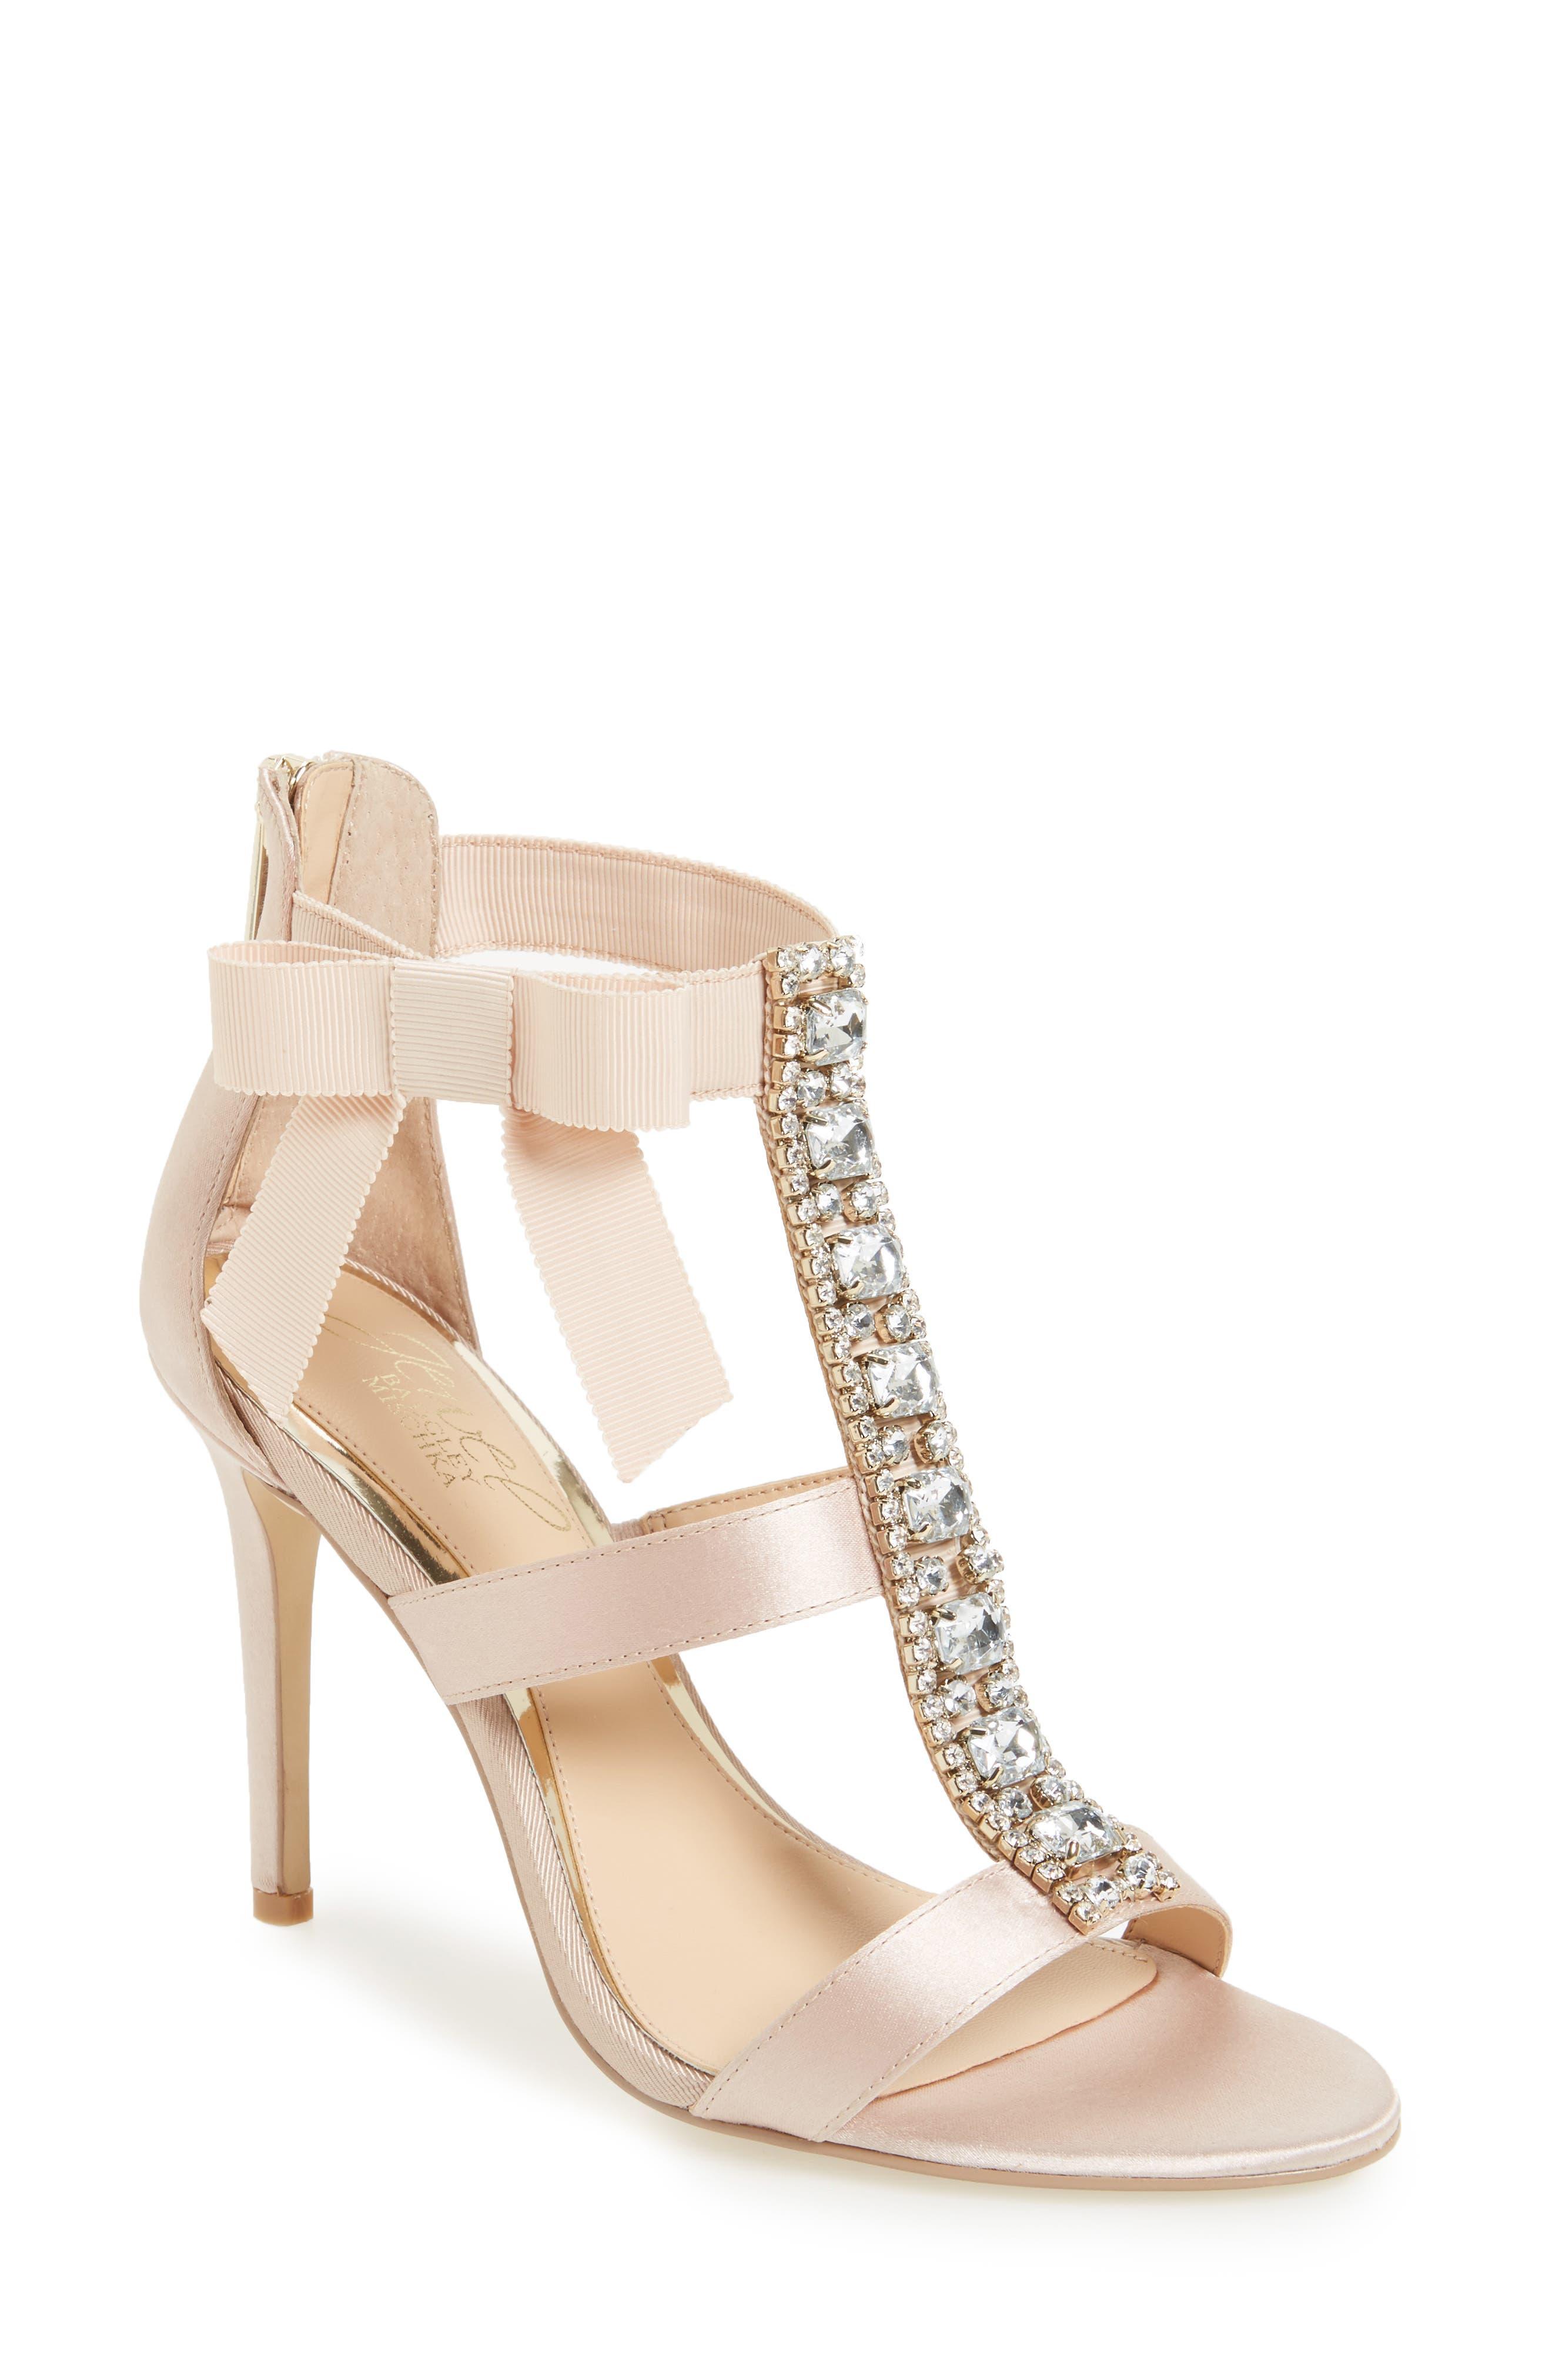 Henderson Embellished Bow Sandal,                         Main,                         color, CHAMPAGNE SATIN